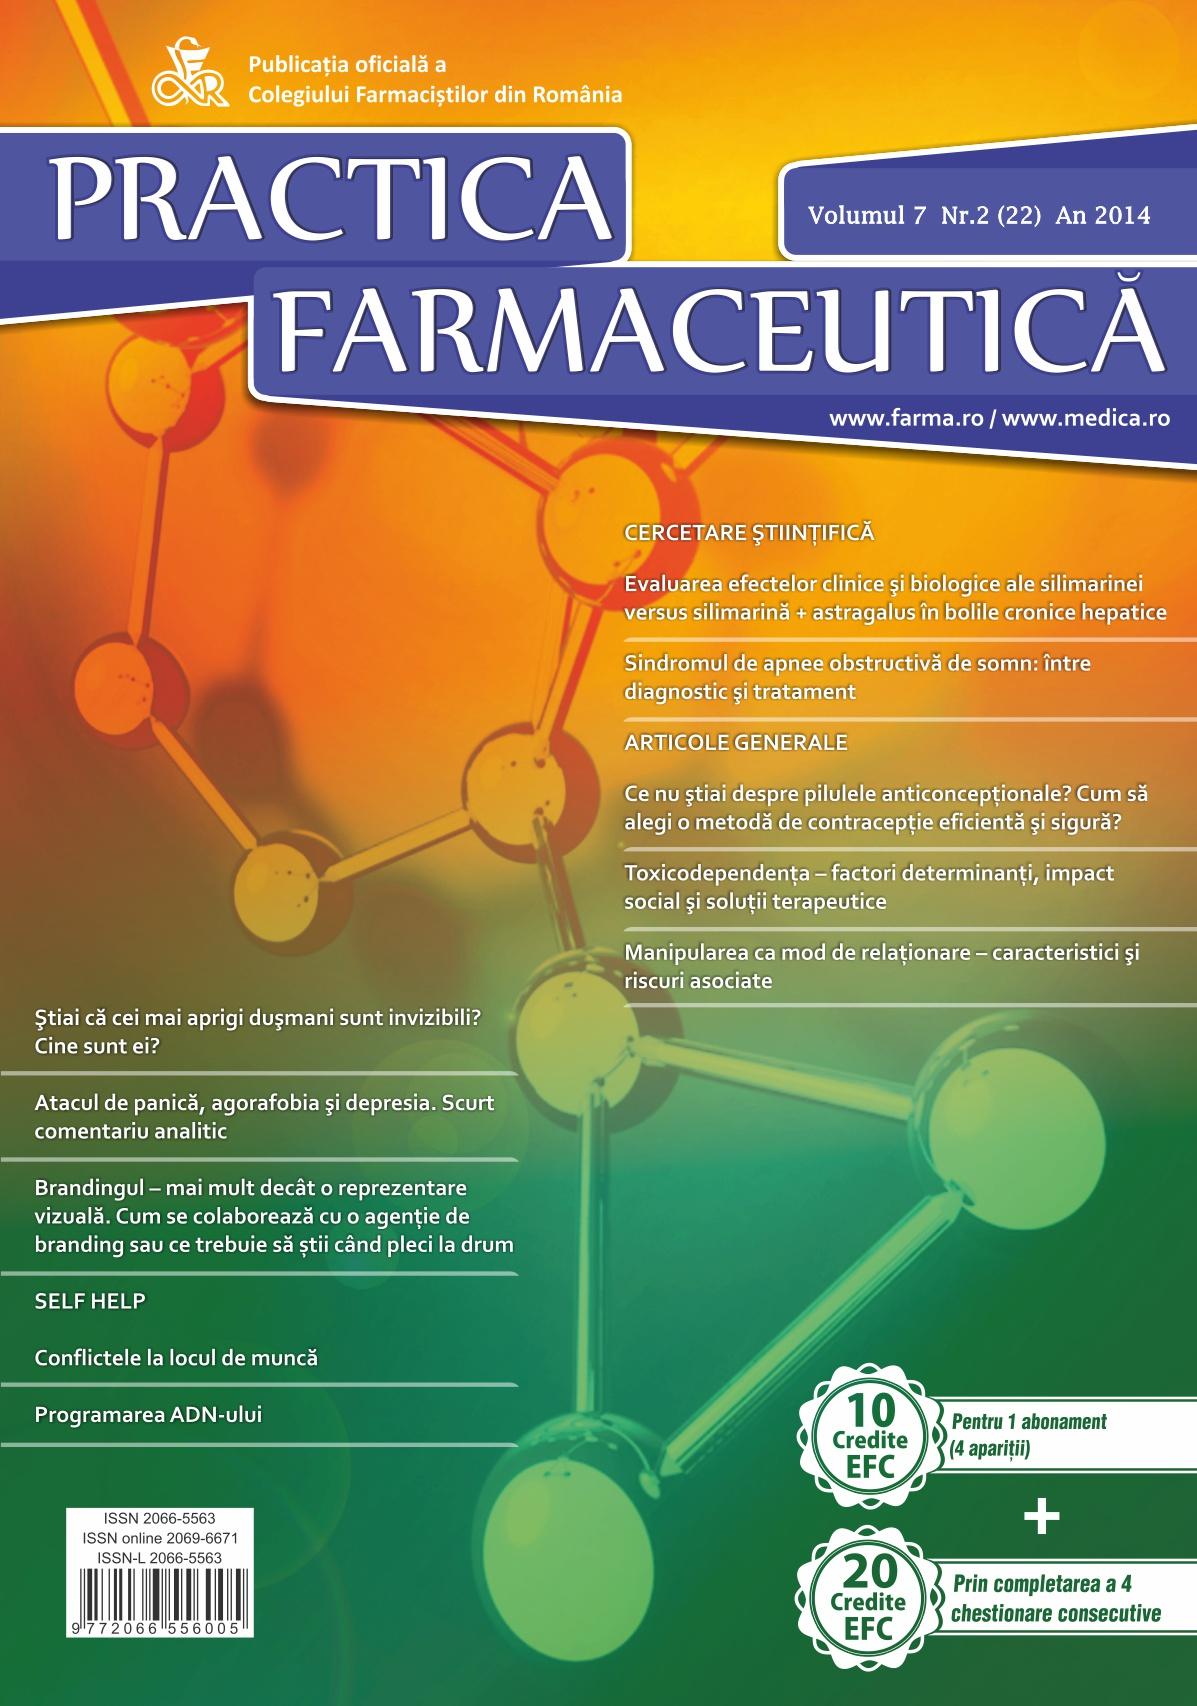 Revista Practica Farmaceutica, Vol. VII, No. 2 (22), 2014